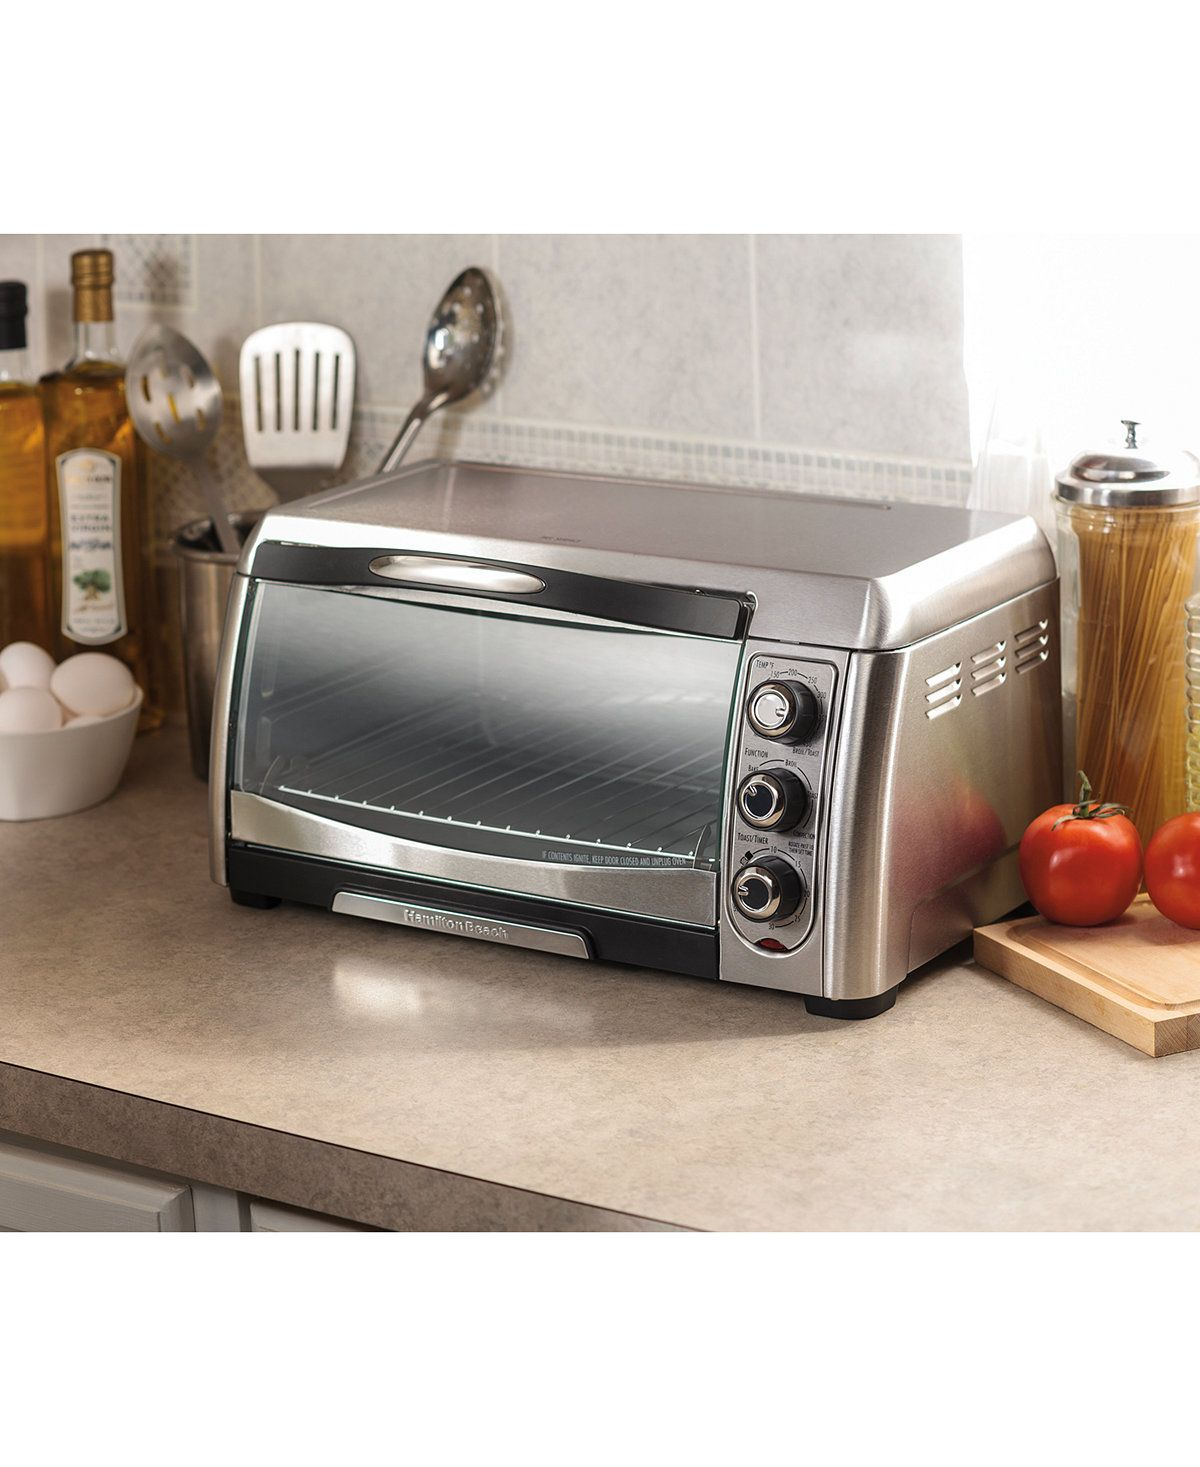 Hamilton Beach Convection Toaster Oven Toasters Toaster Ovens Kitchen Macy S Convection Toaster Oven Toaster Oven Small Appliances